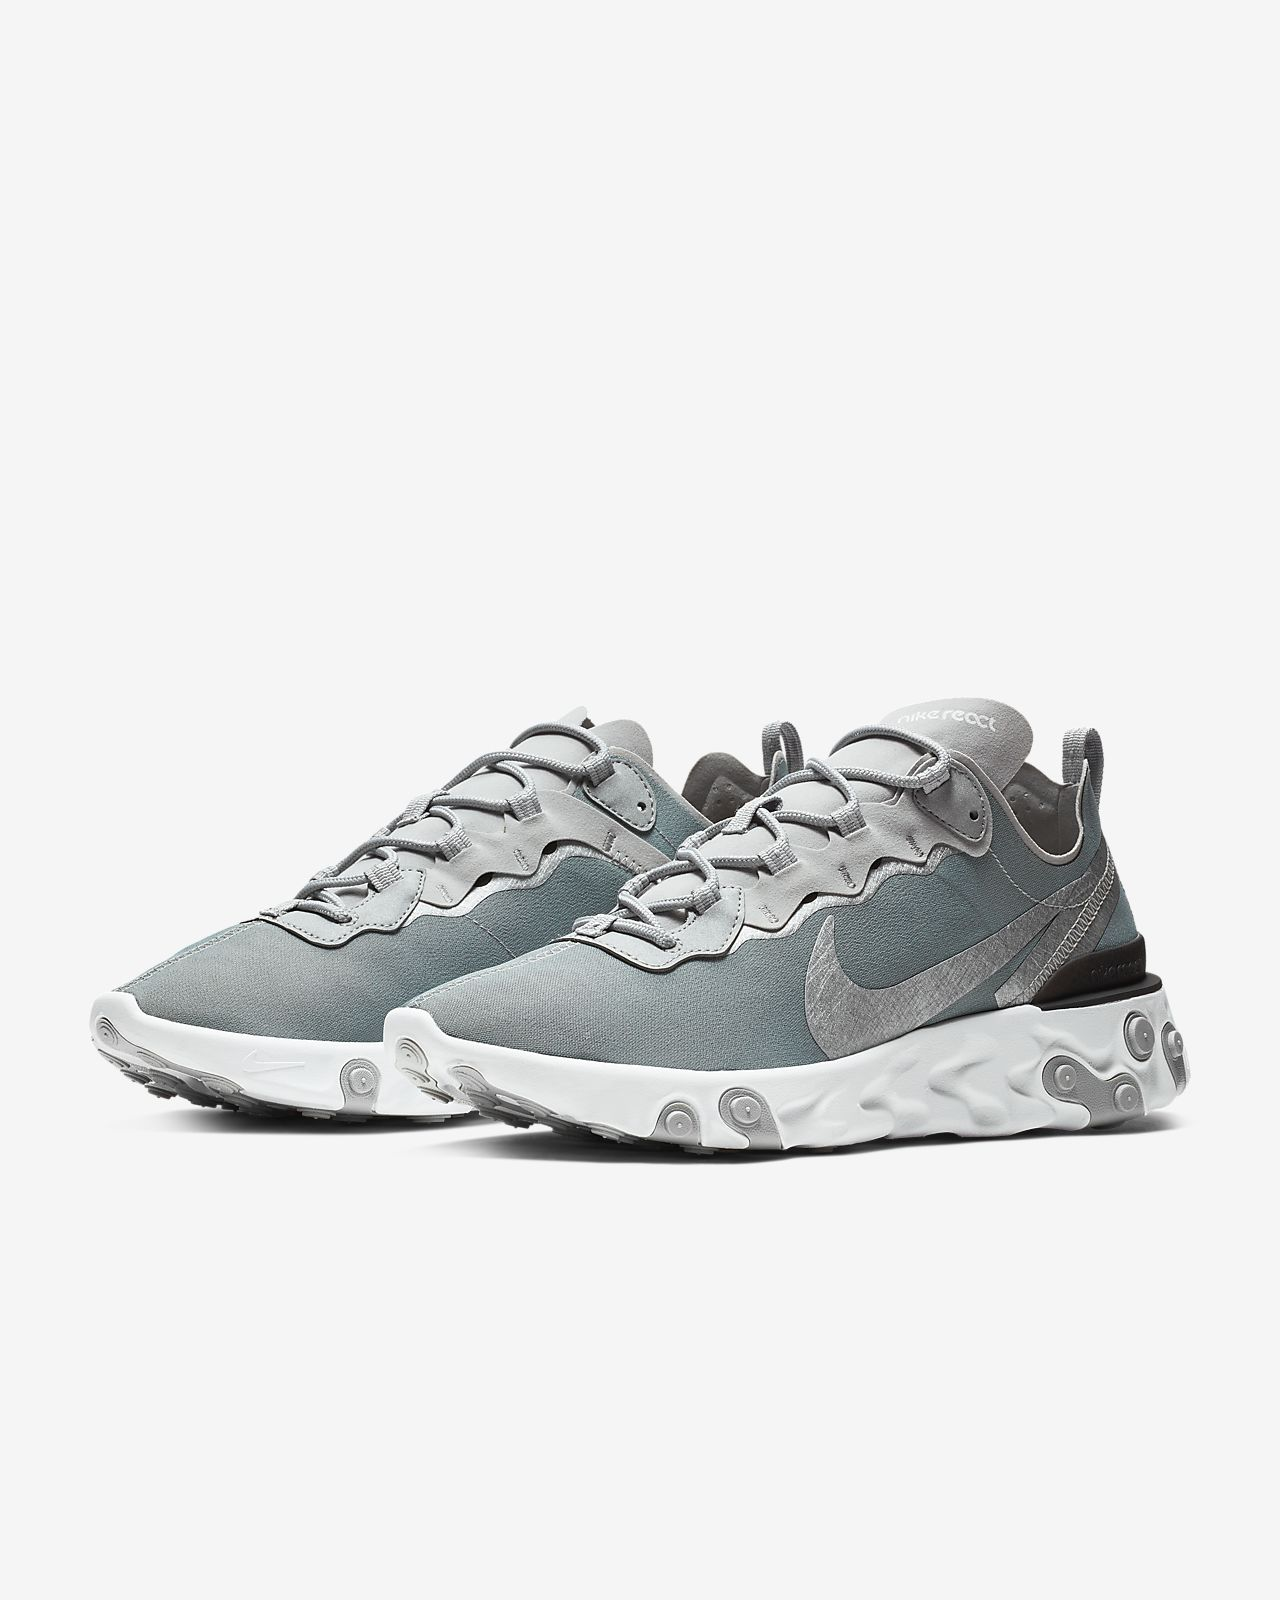 a3ef94d9db7 Nike React Element 55 Men s Shoe. Nike.com